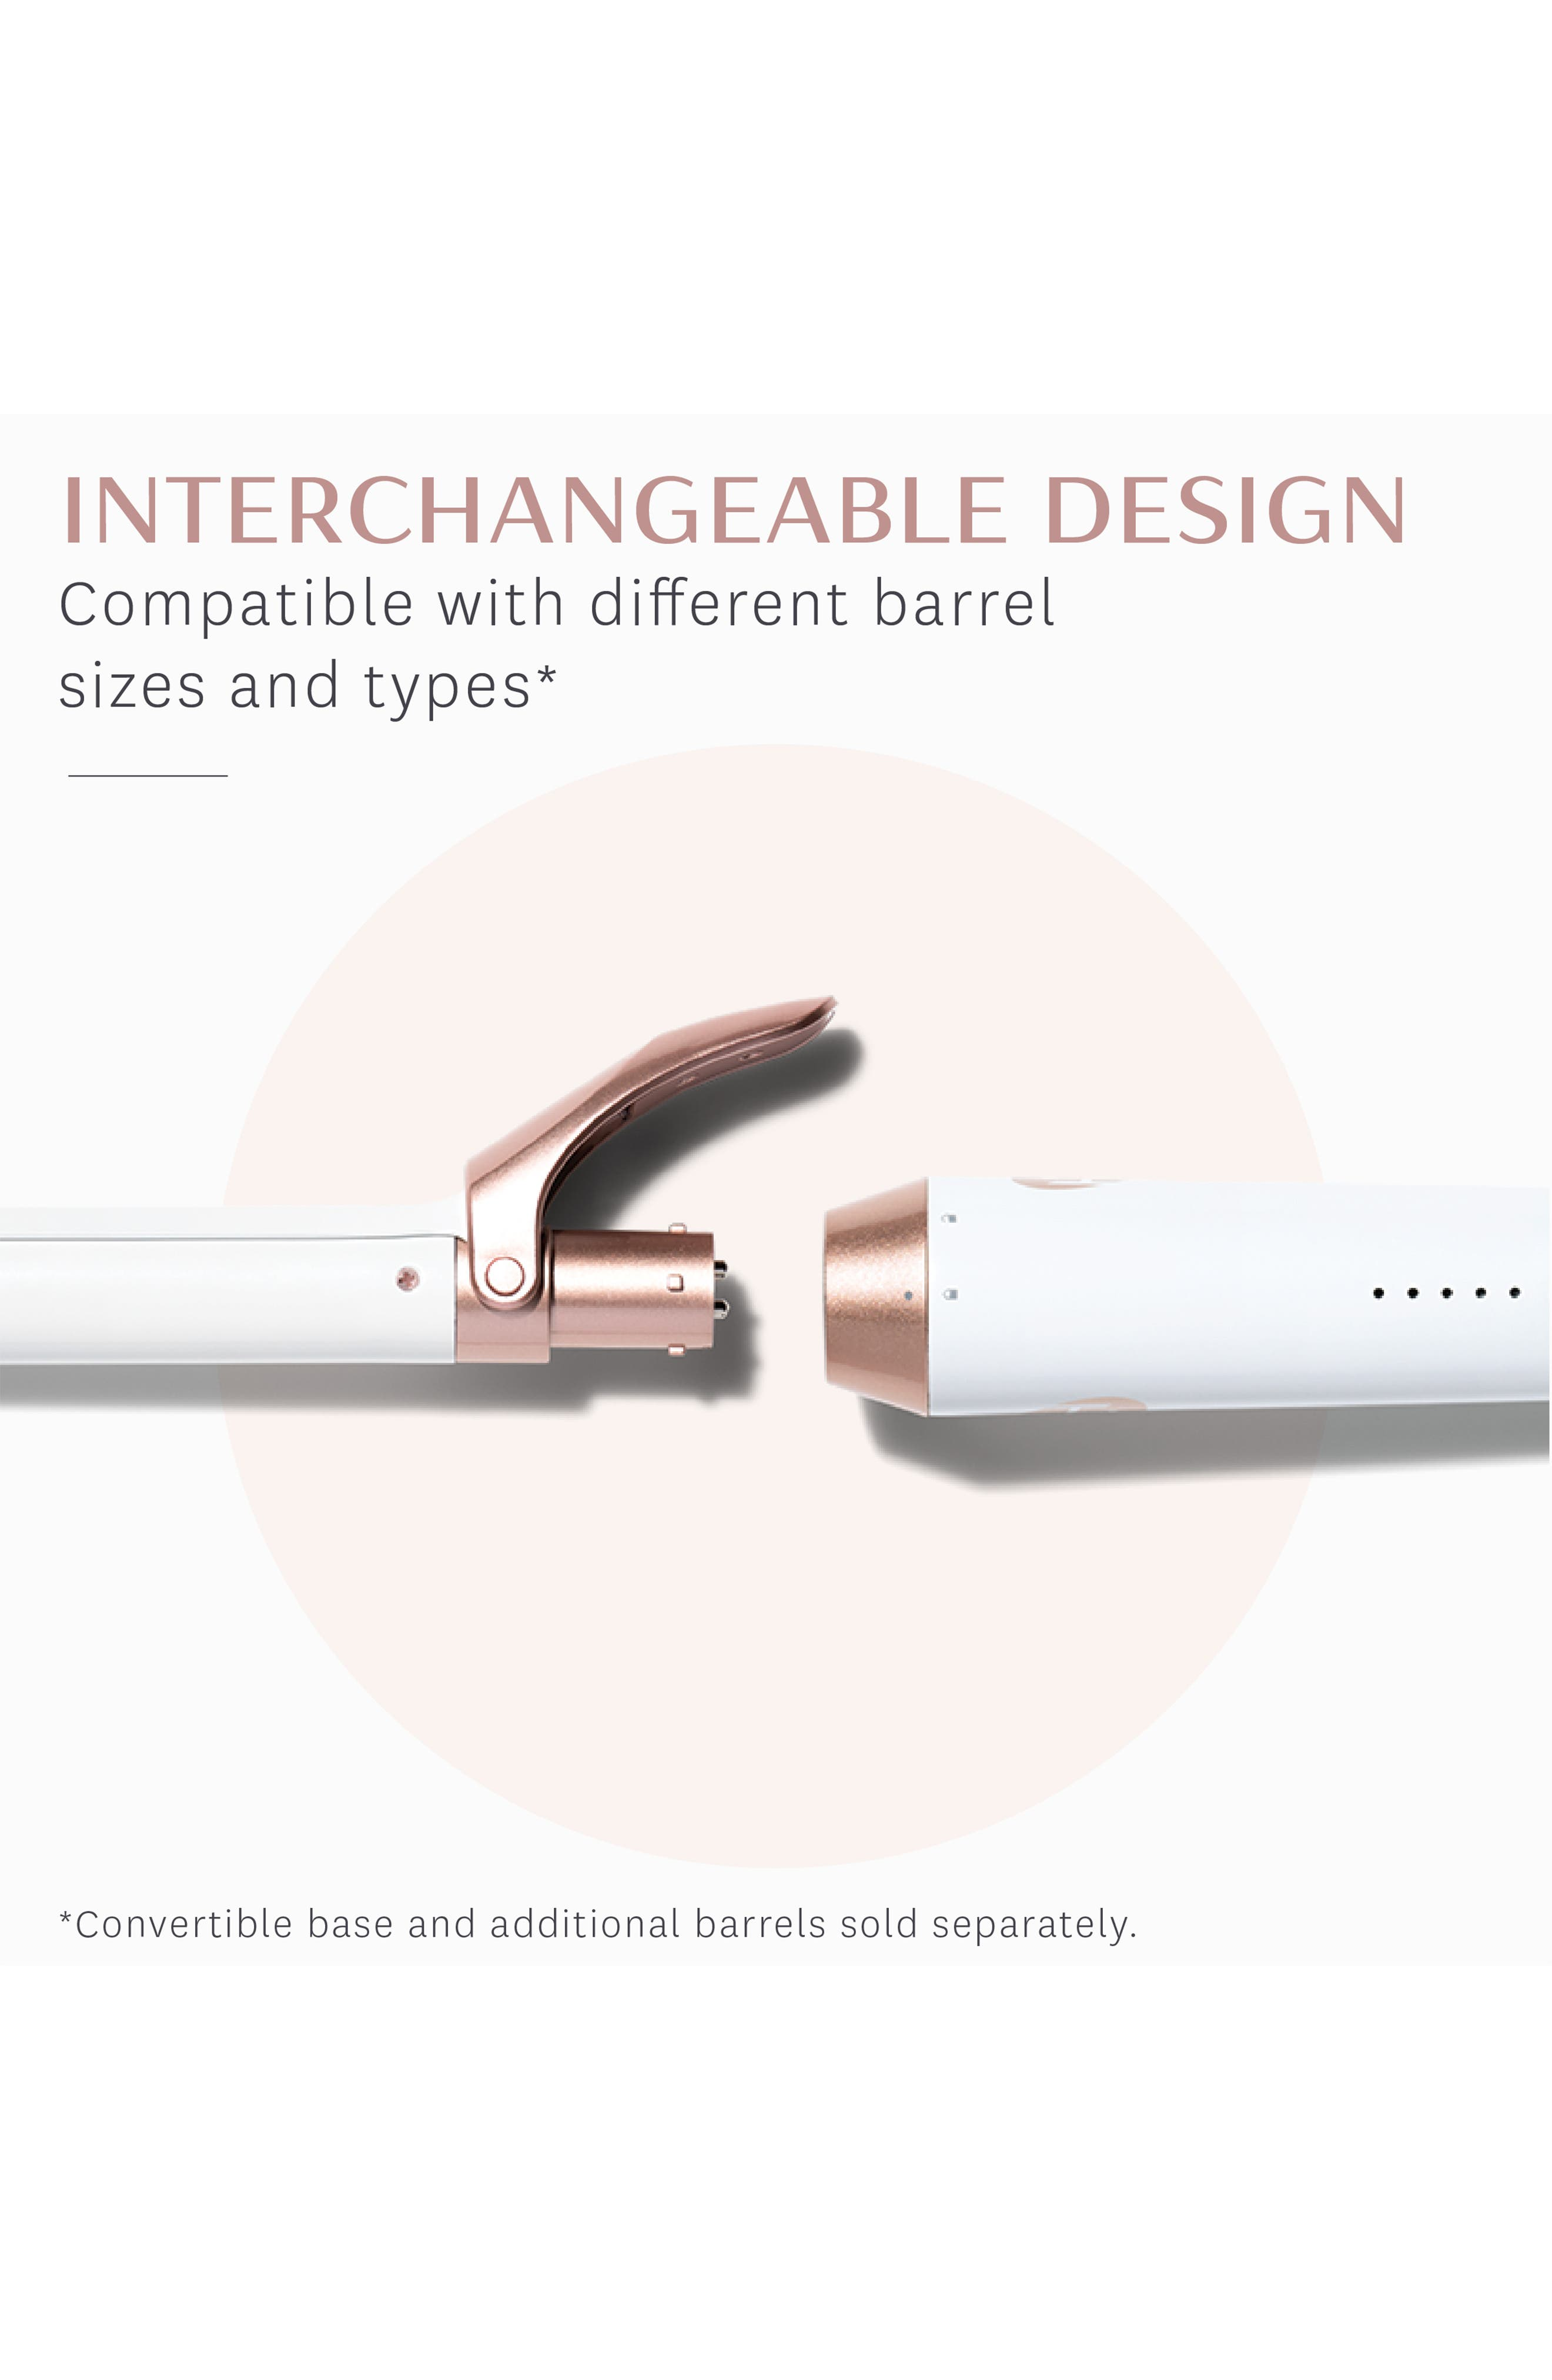 Defined Curls 1-Inch Interchangeable Clip Curling Iron Barrel,                             Alternate thumbnail 2, color,                             000